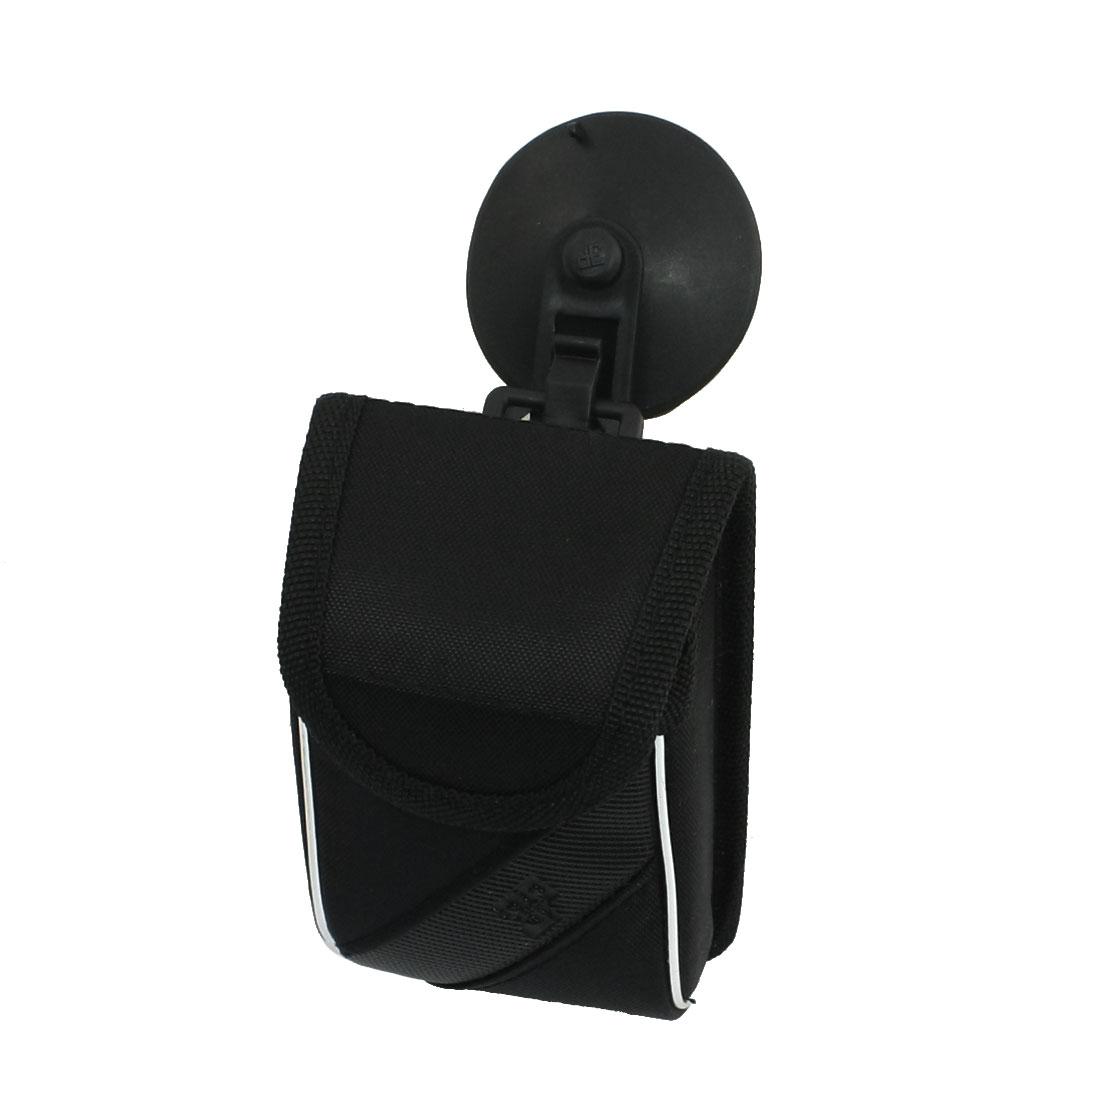 Car Air Vent Mount Black Nylon Phone Pocket Pouch Bag w Sucker